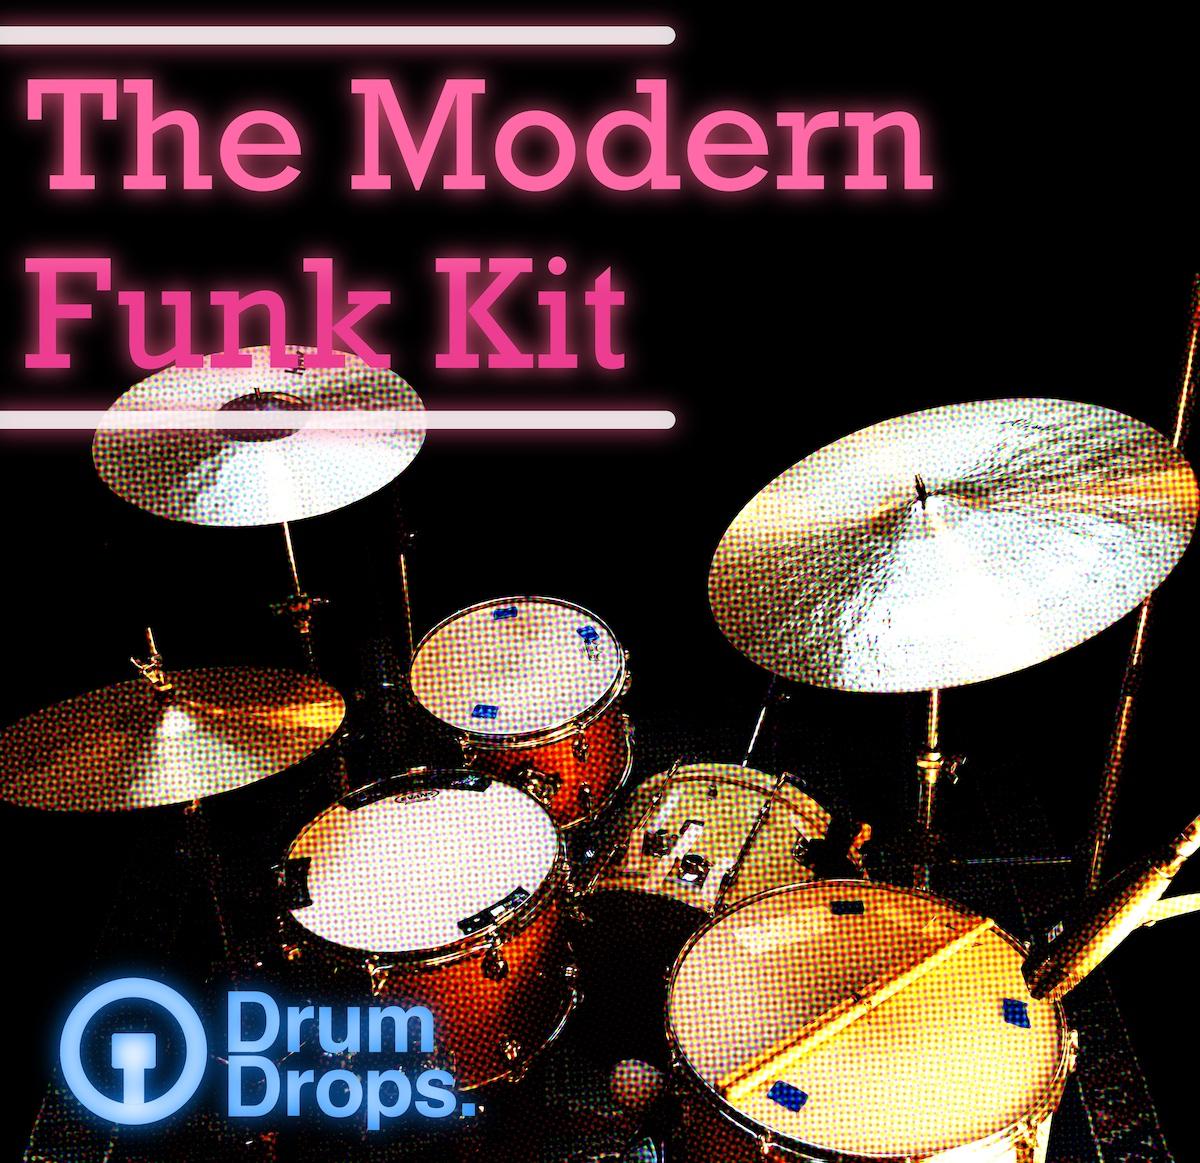 The Modern Funk Kit